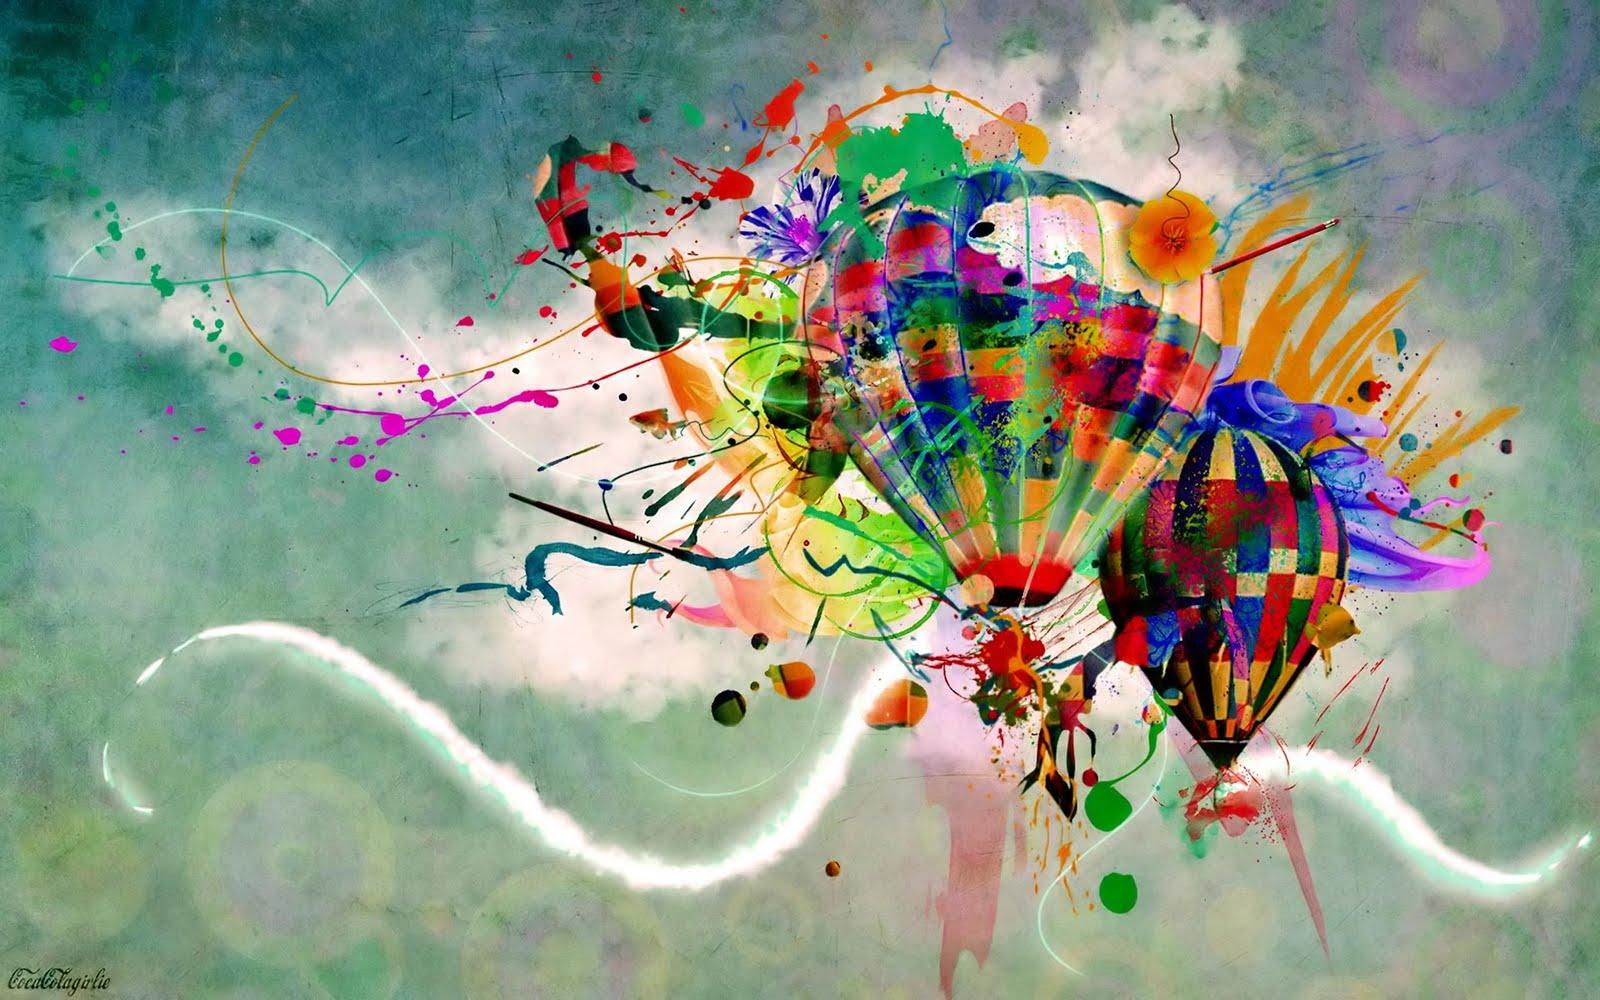 http://3.bp.blogspot.com/-_DtkHxTzIqM/TgY8wggEFfI/AAAAAAAAA5Y/xLgP5v1TVO0/s1600/Stratospheric_balloons_widescreen_wallpaper.jpg